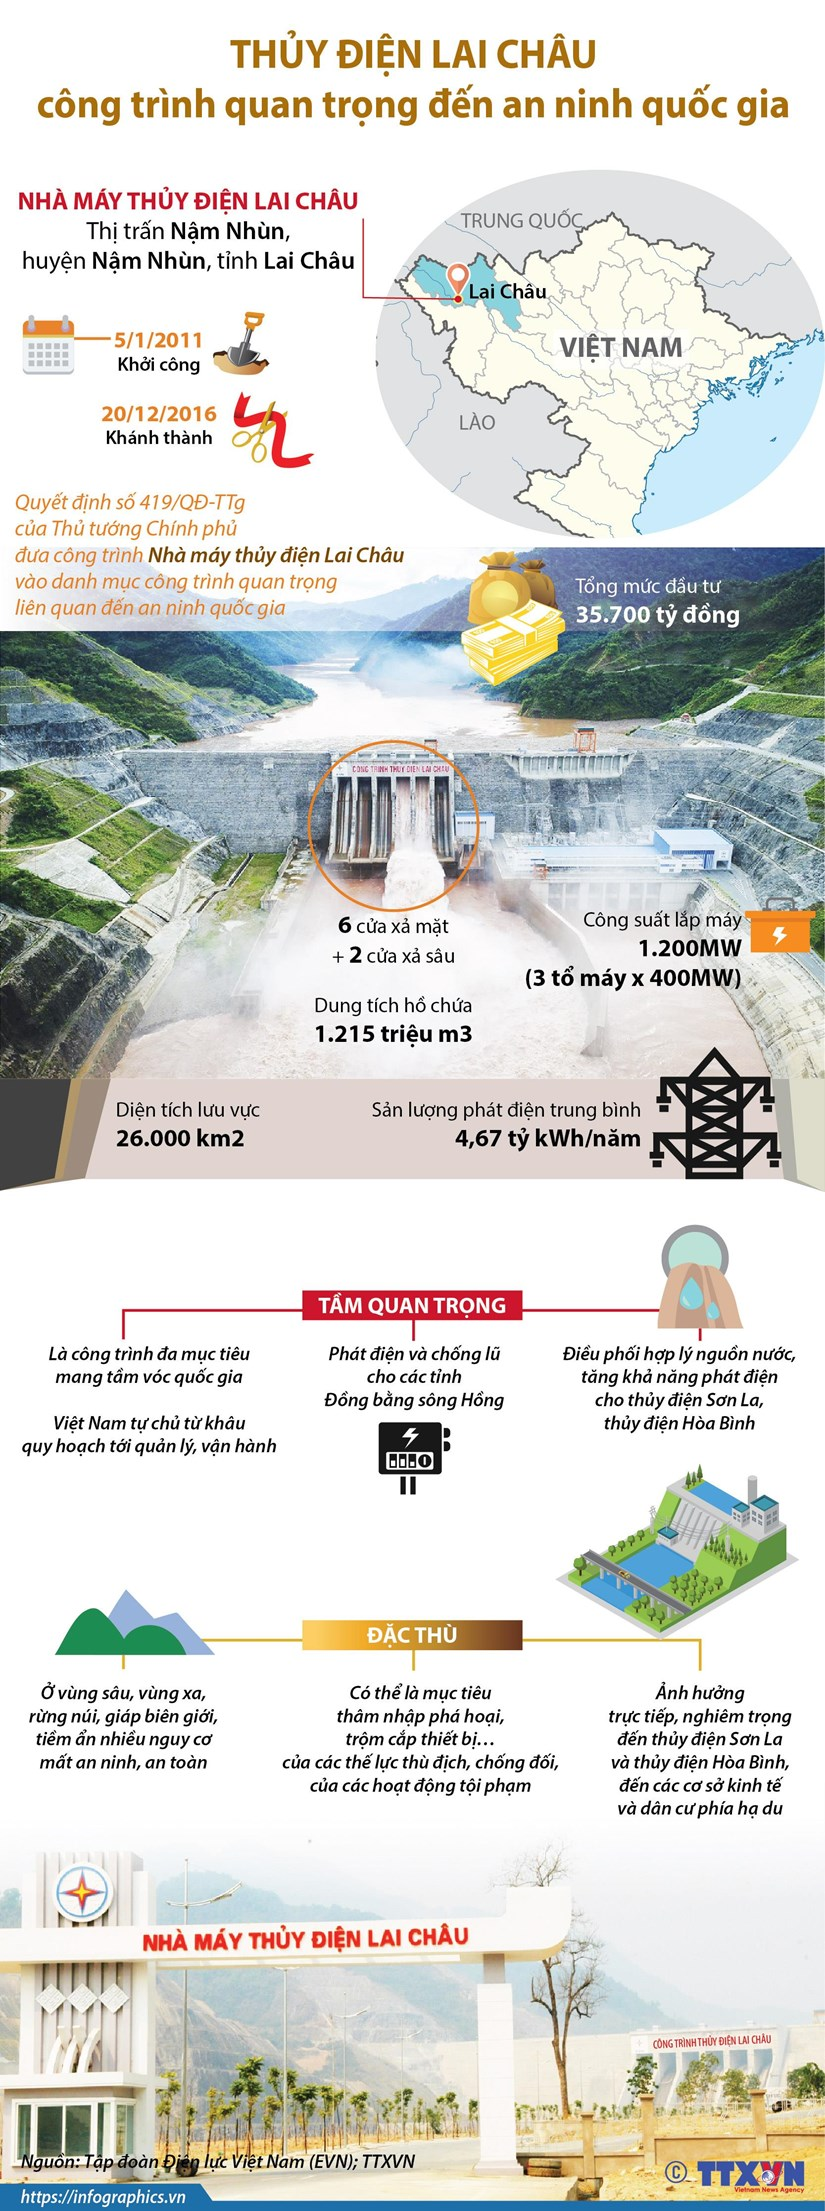 [Infographics] Thuy dien Lai Chau la cong trinh quan trong den an ninh hinh anh 1